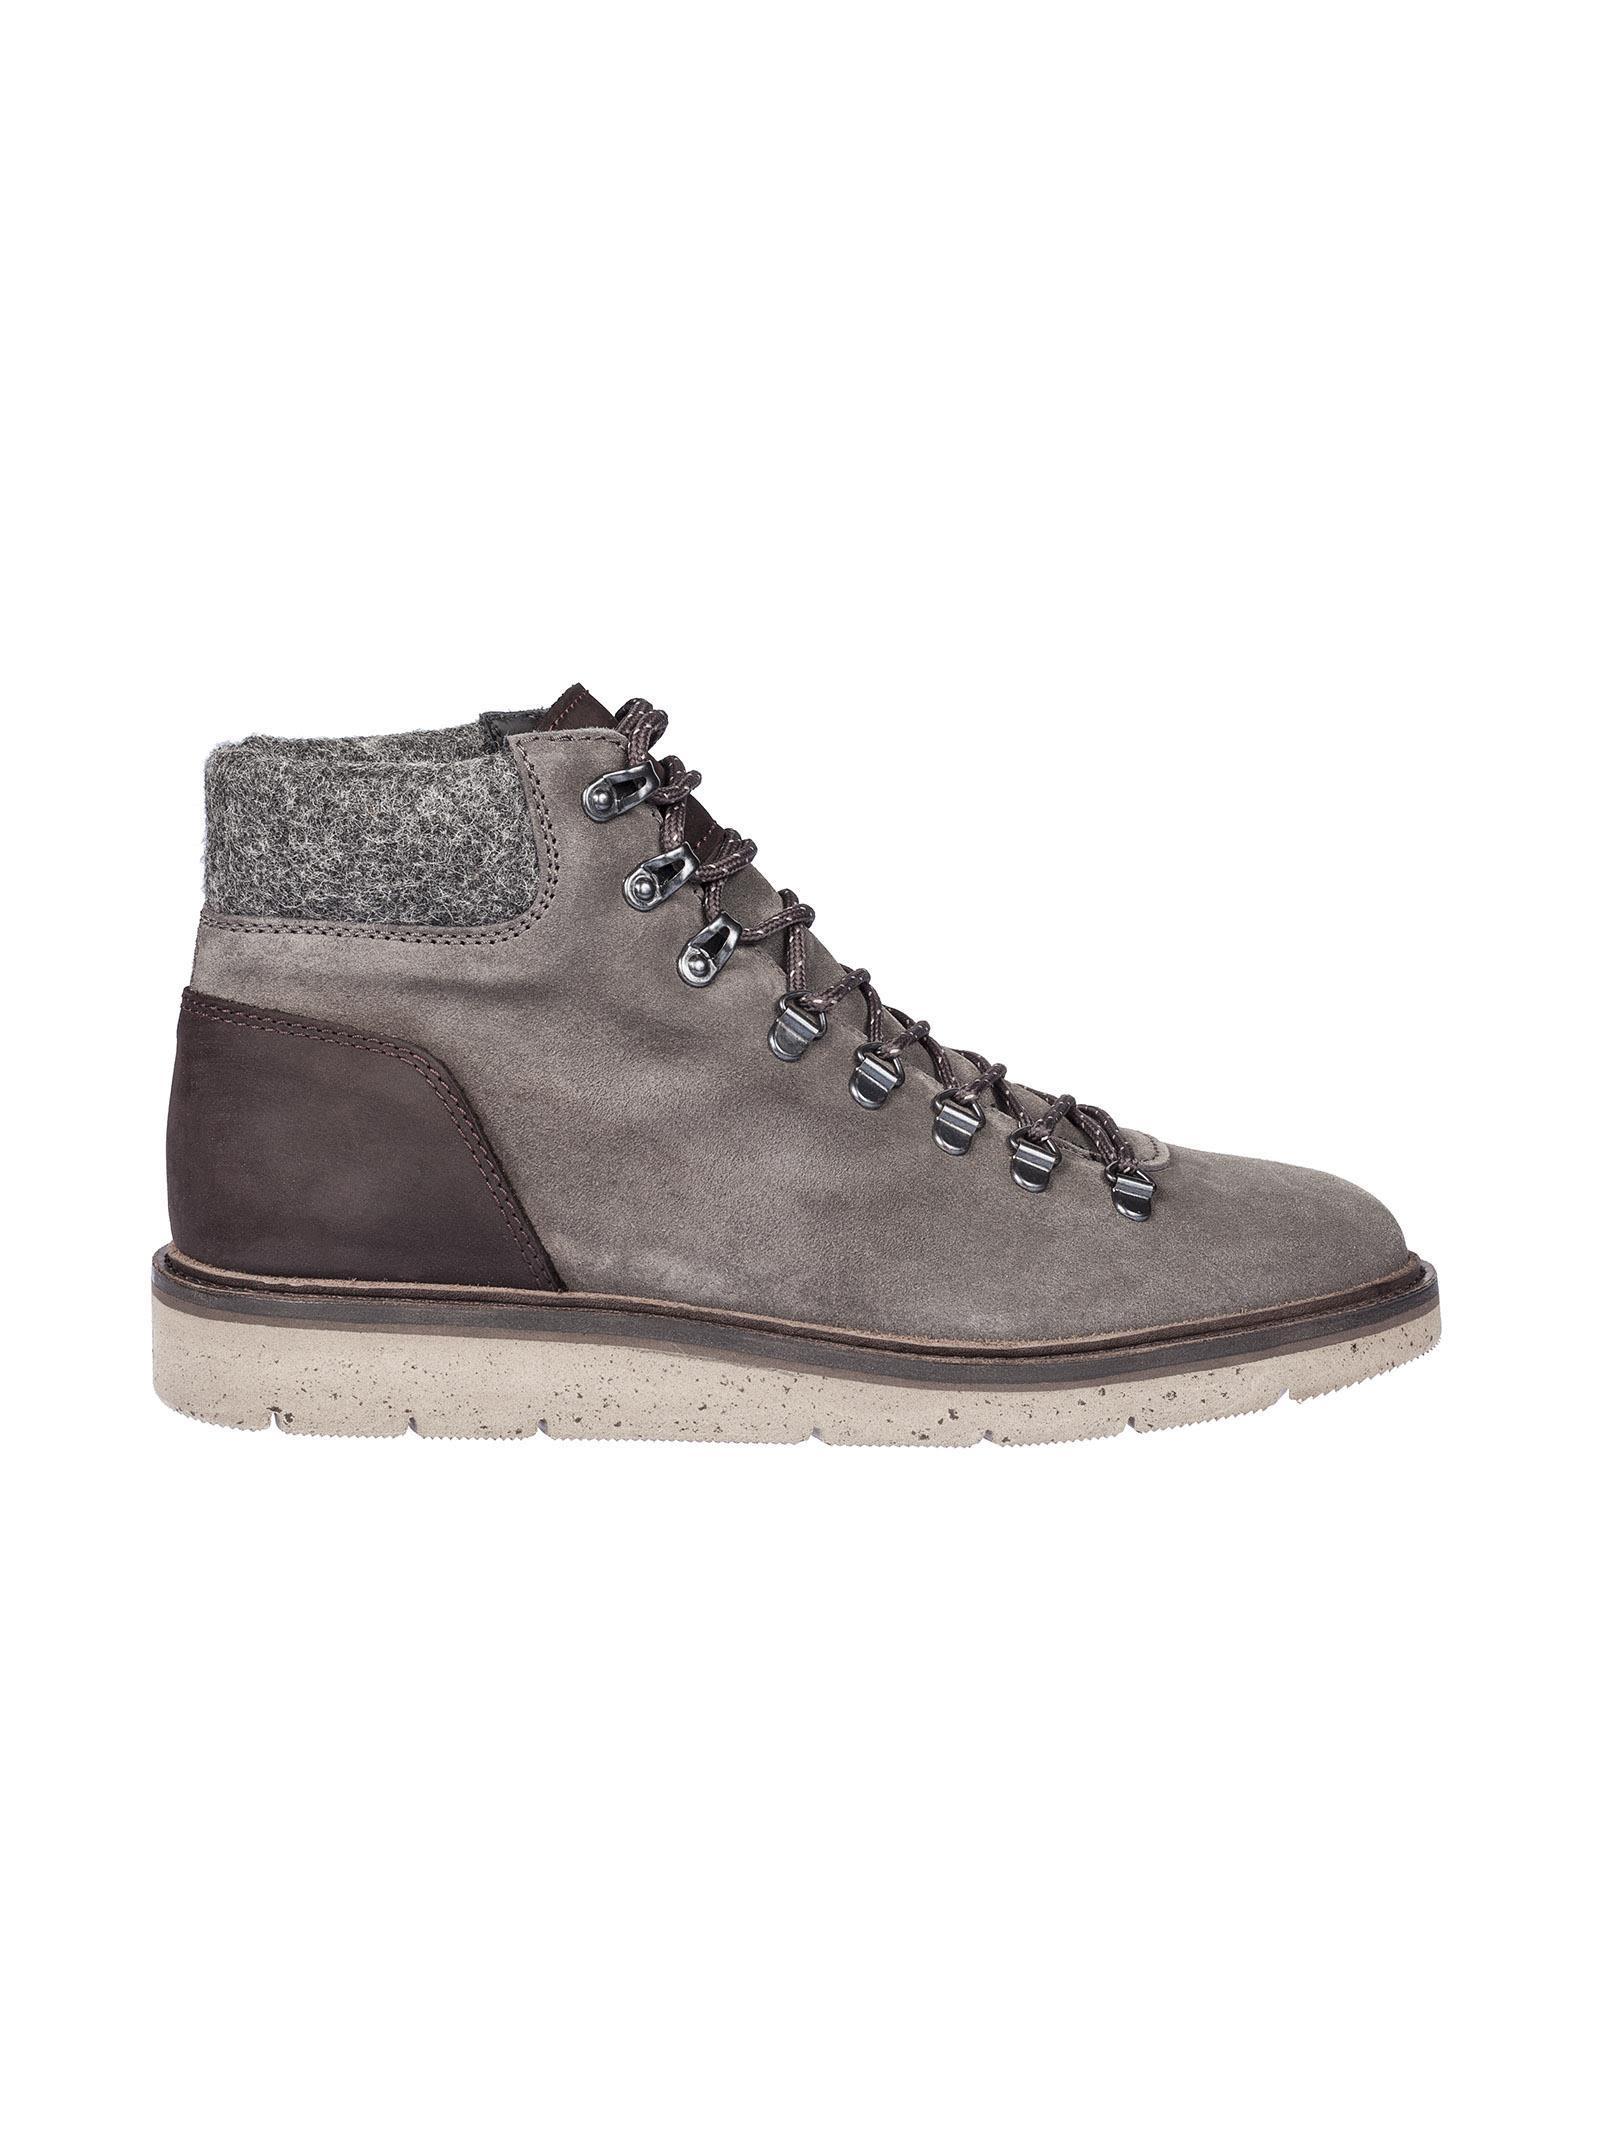 Hogan H334 Hiking Boots In Brown   ModeSens